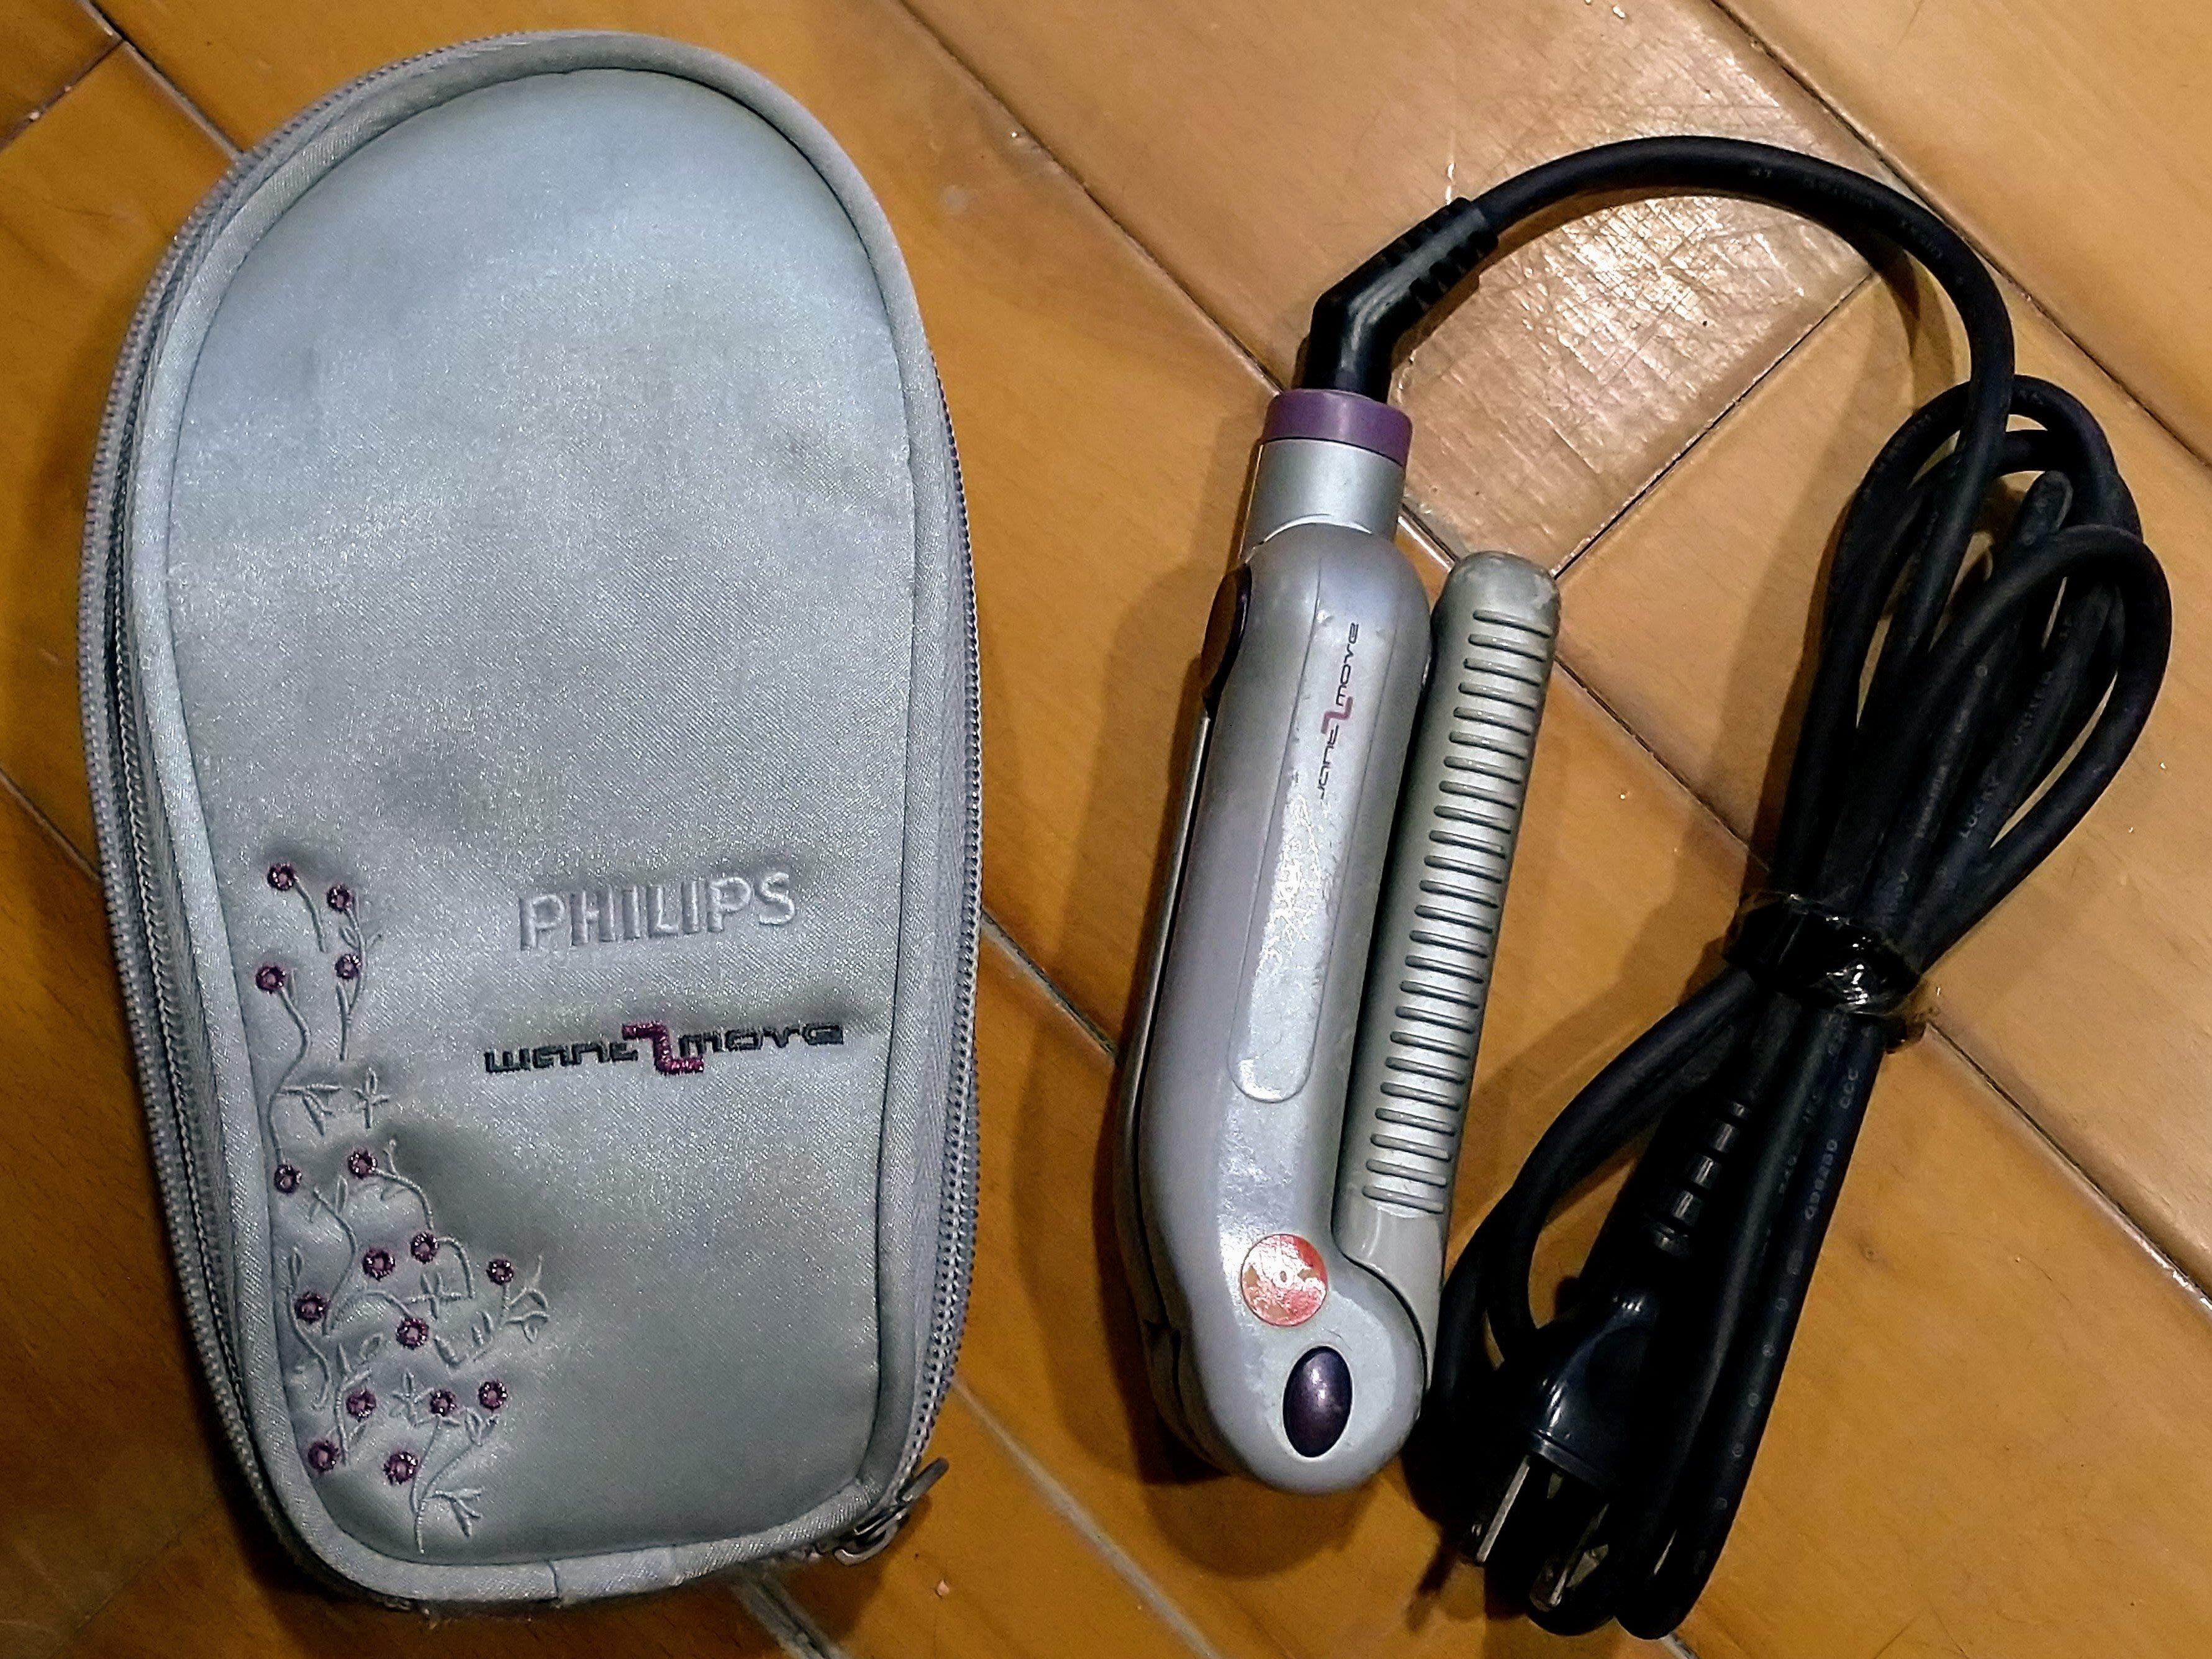 Philips飛利浦沙龍級旅行用直髮器/離子夾HP-4646